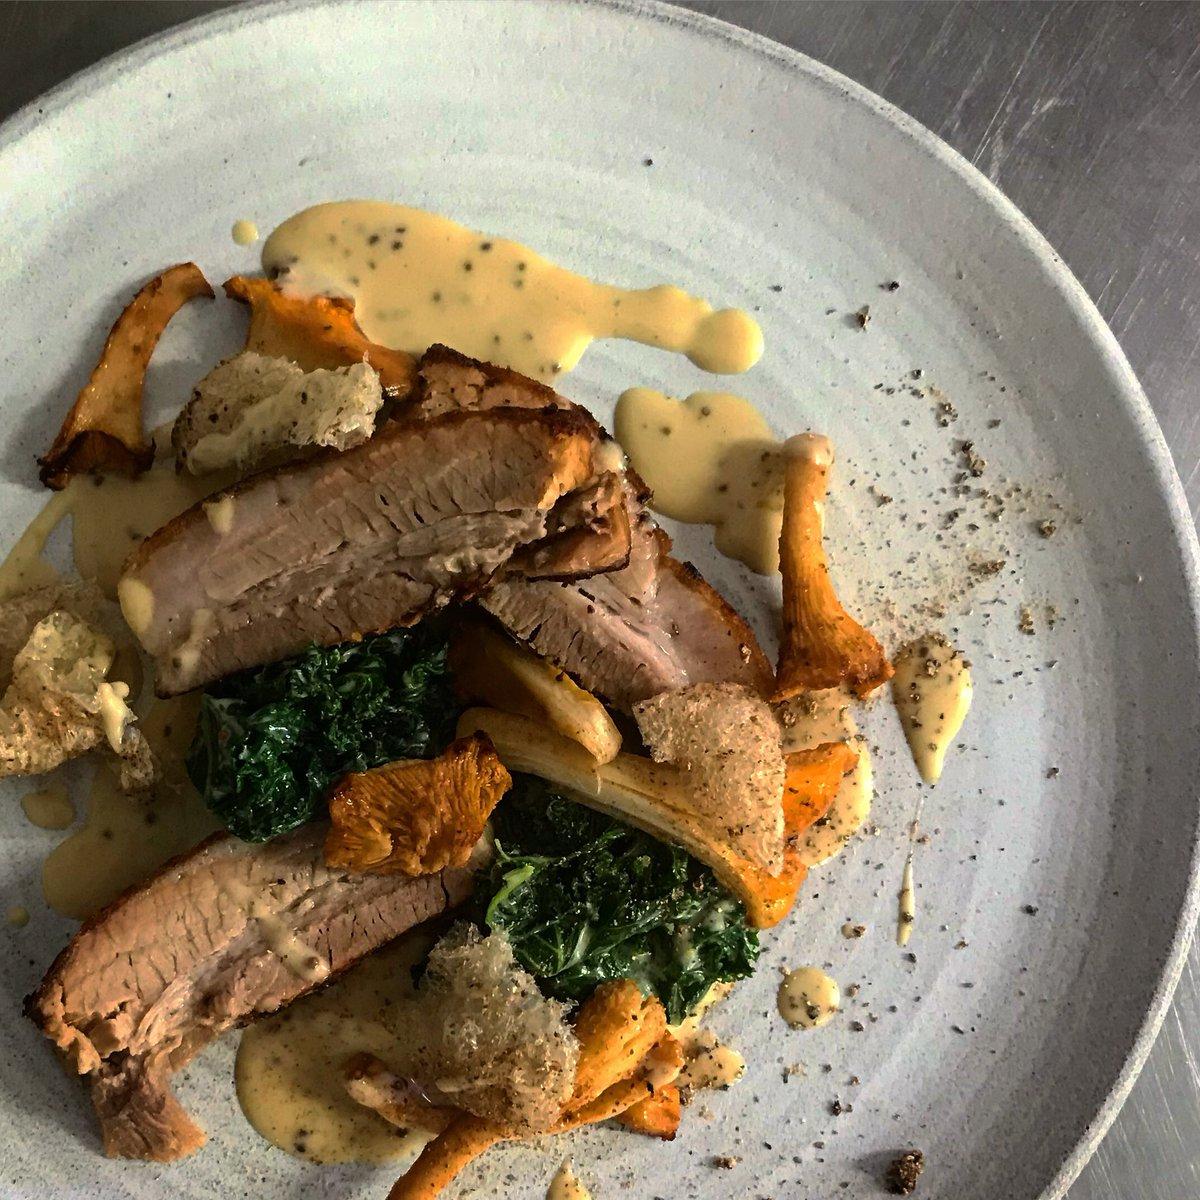 @dingleydellpork Belly, Girolles, Kale, Mustard, Cream....on the menu now. #delicious https://t.co/jgdRdlRgPo